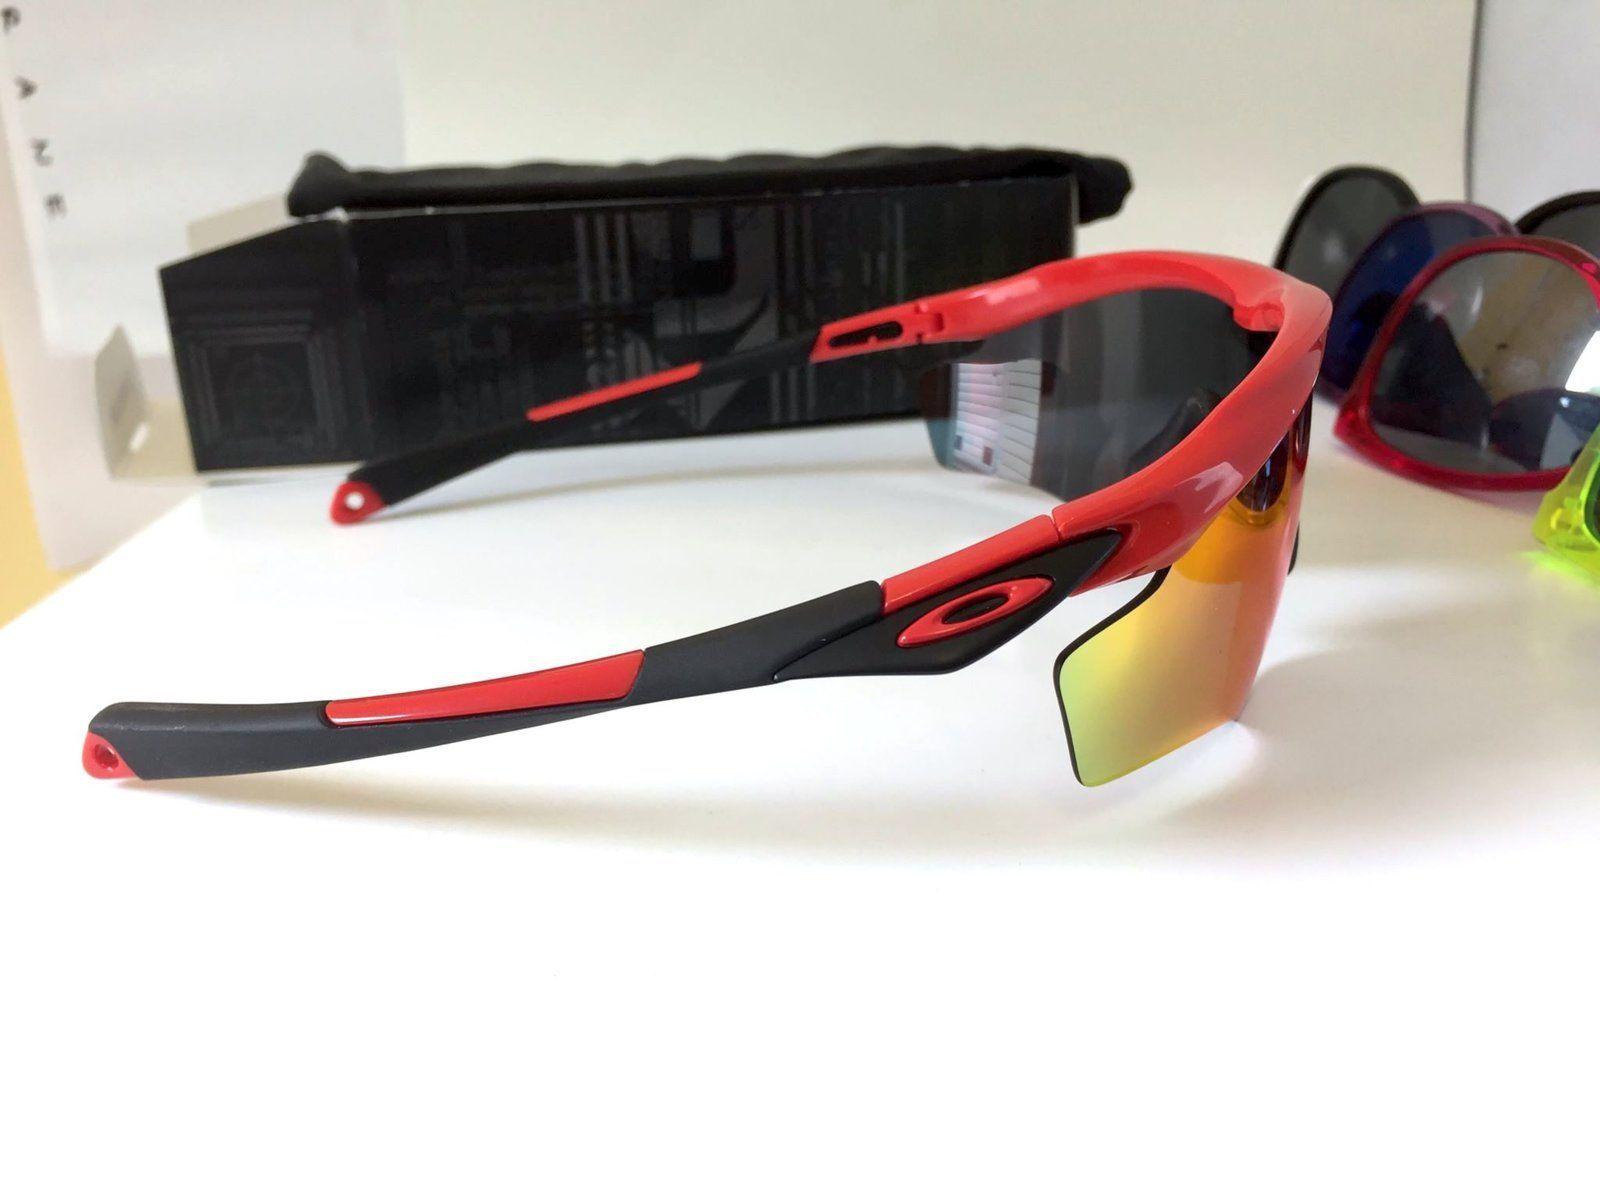 7c10e77a94 M2 Frame w new Positive Red Iridium lens -  39467986 1946556622075844 2962109253218729984 n.jpg